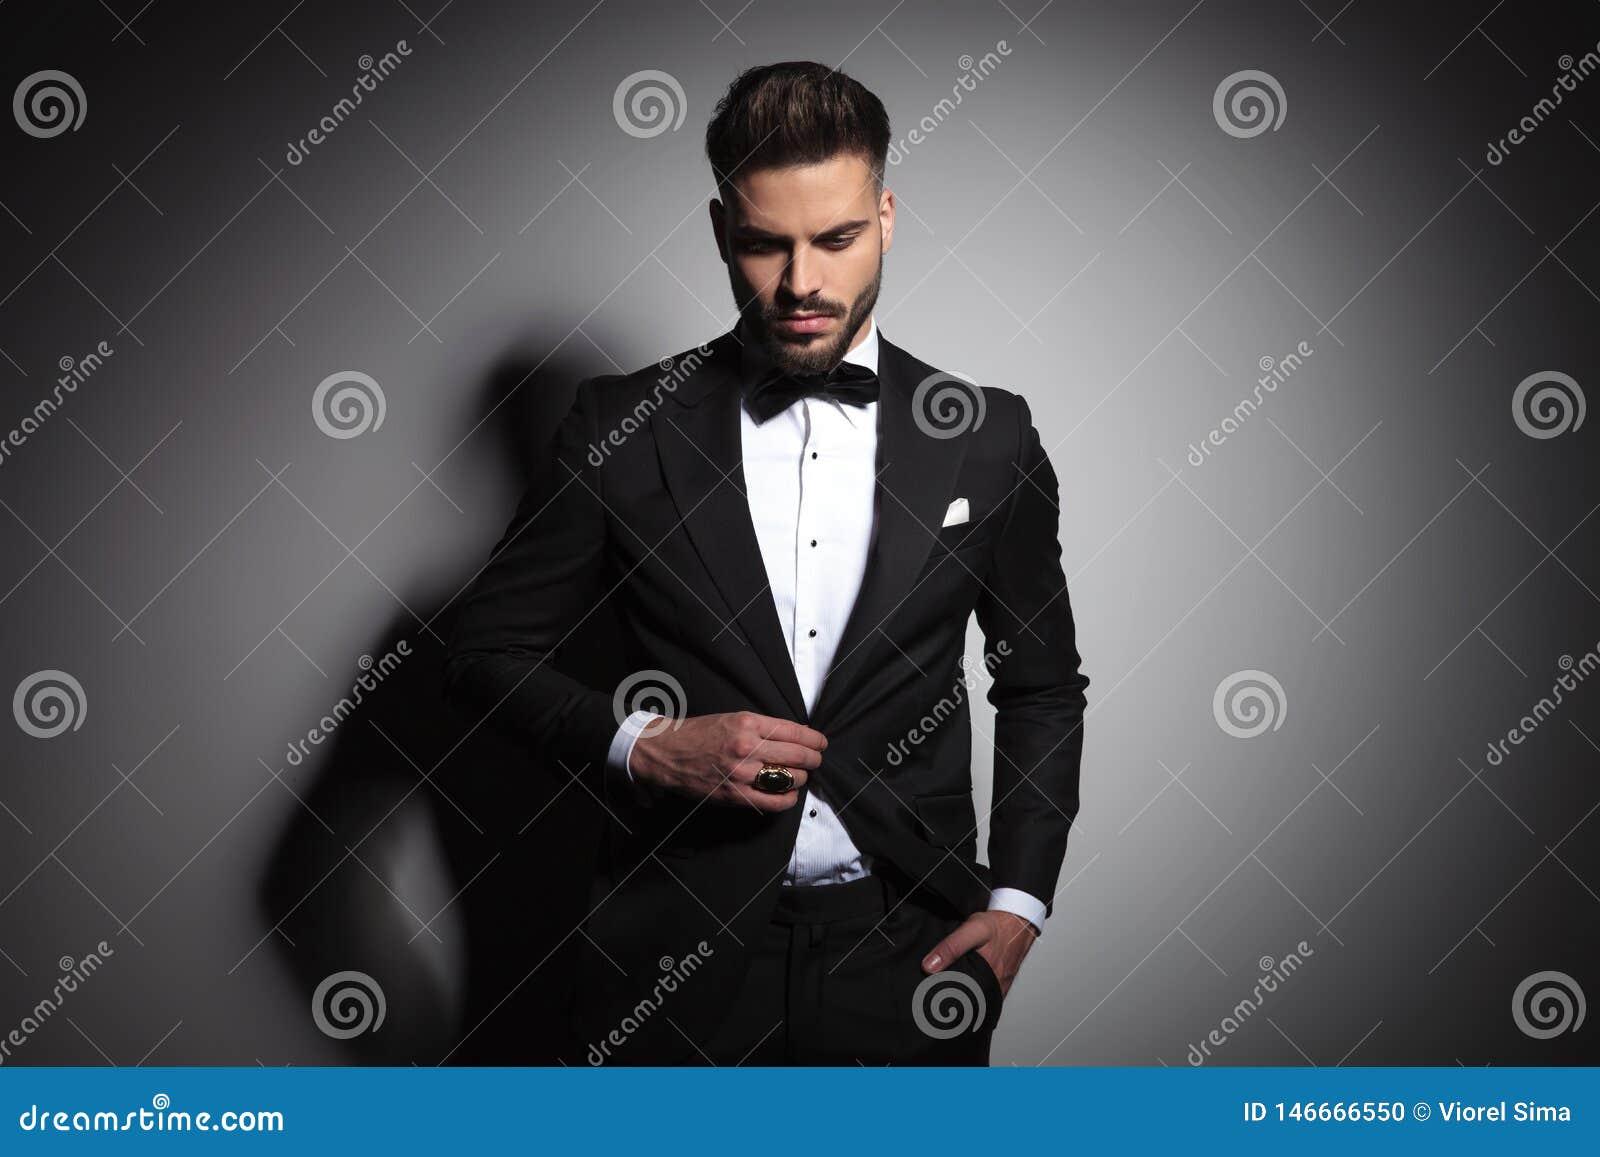 handsome guy in black tuxedo holding hand in pocket